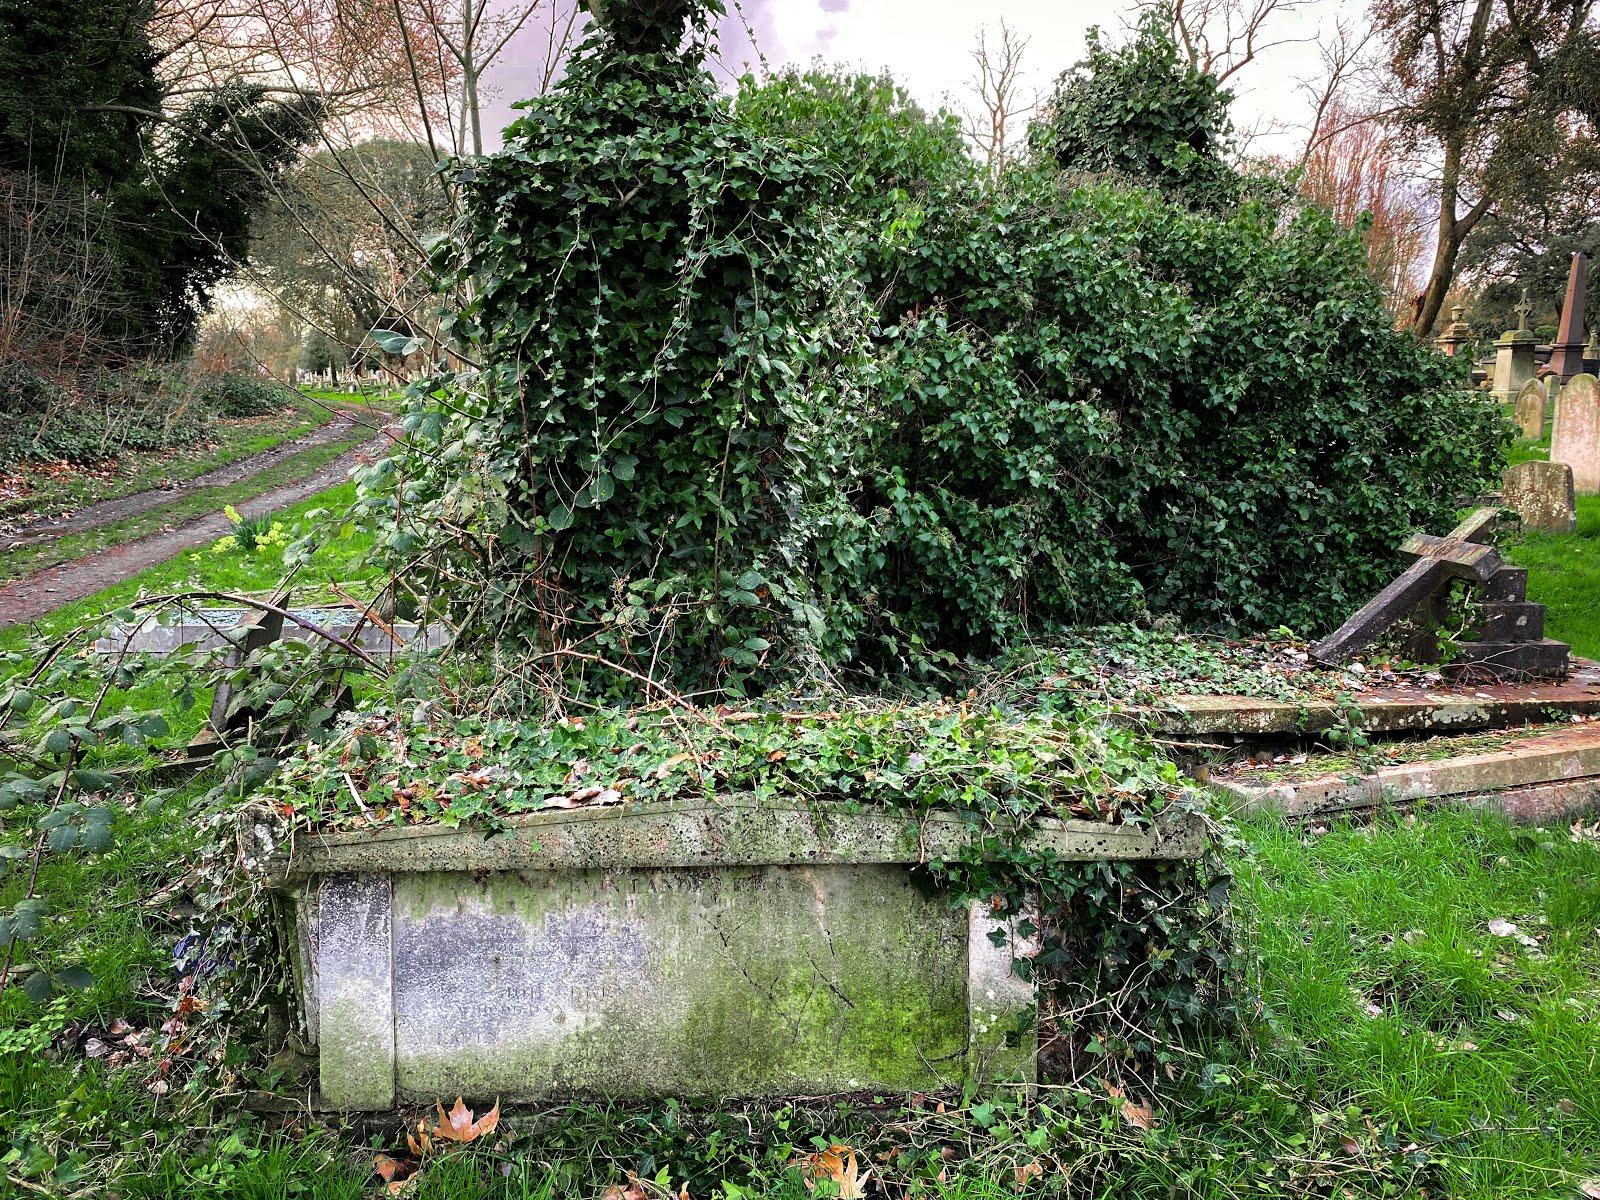 Lander's tomb.